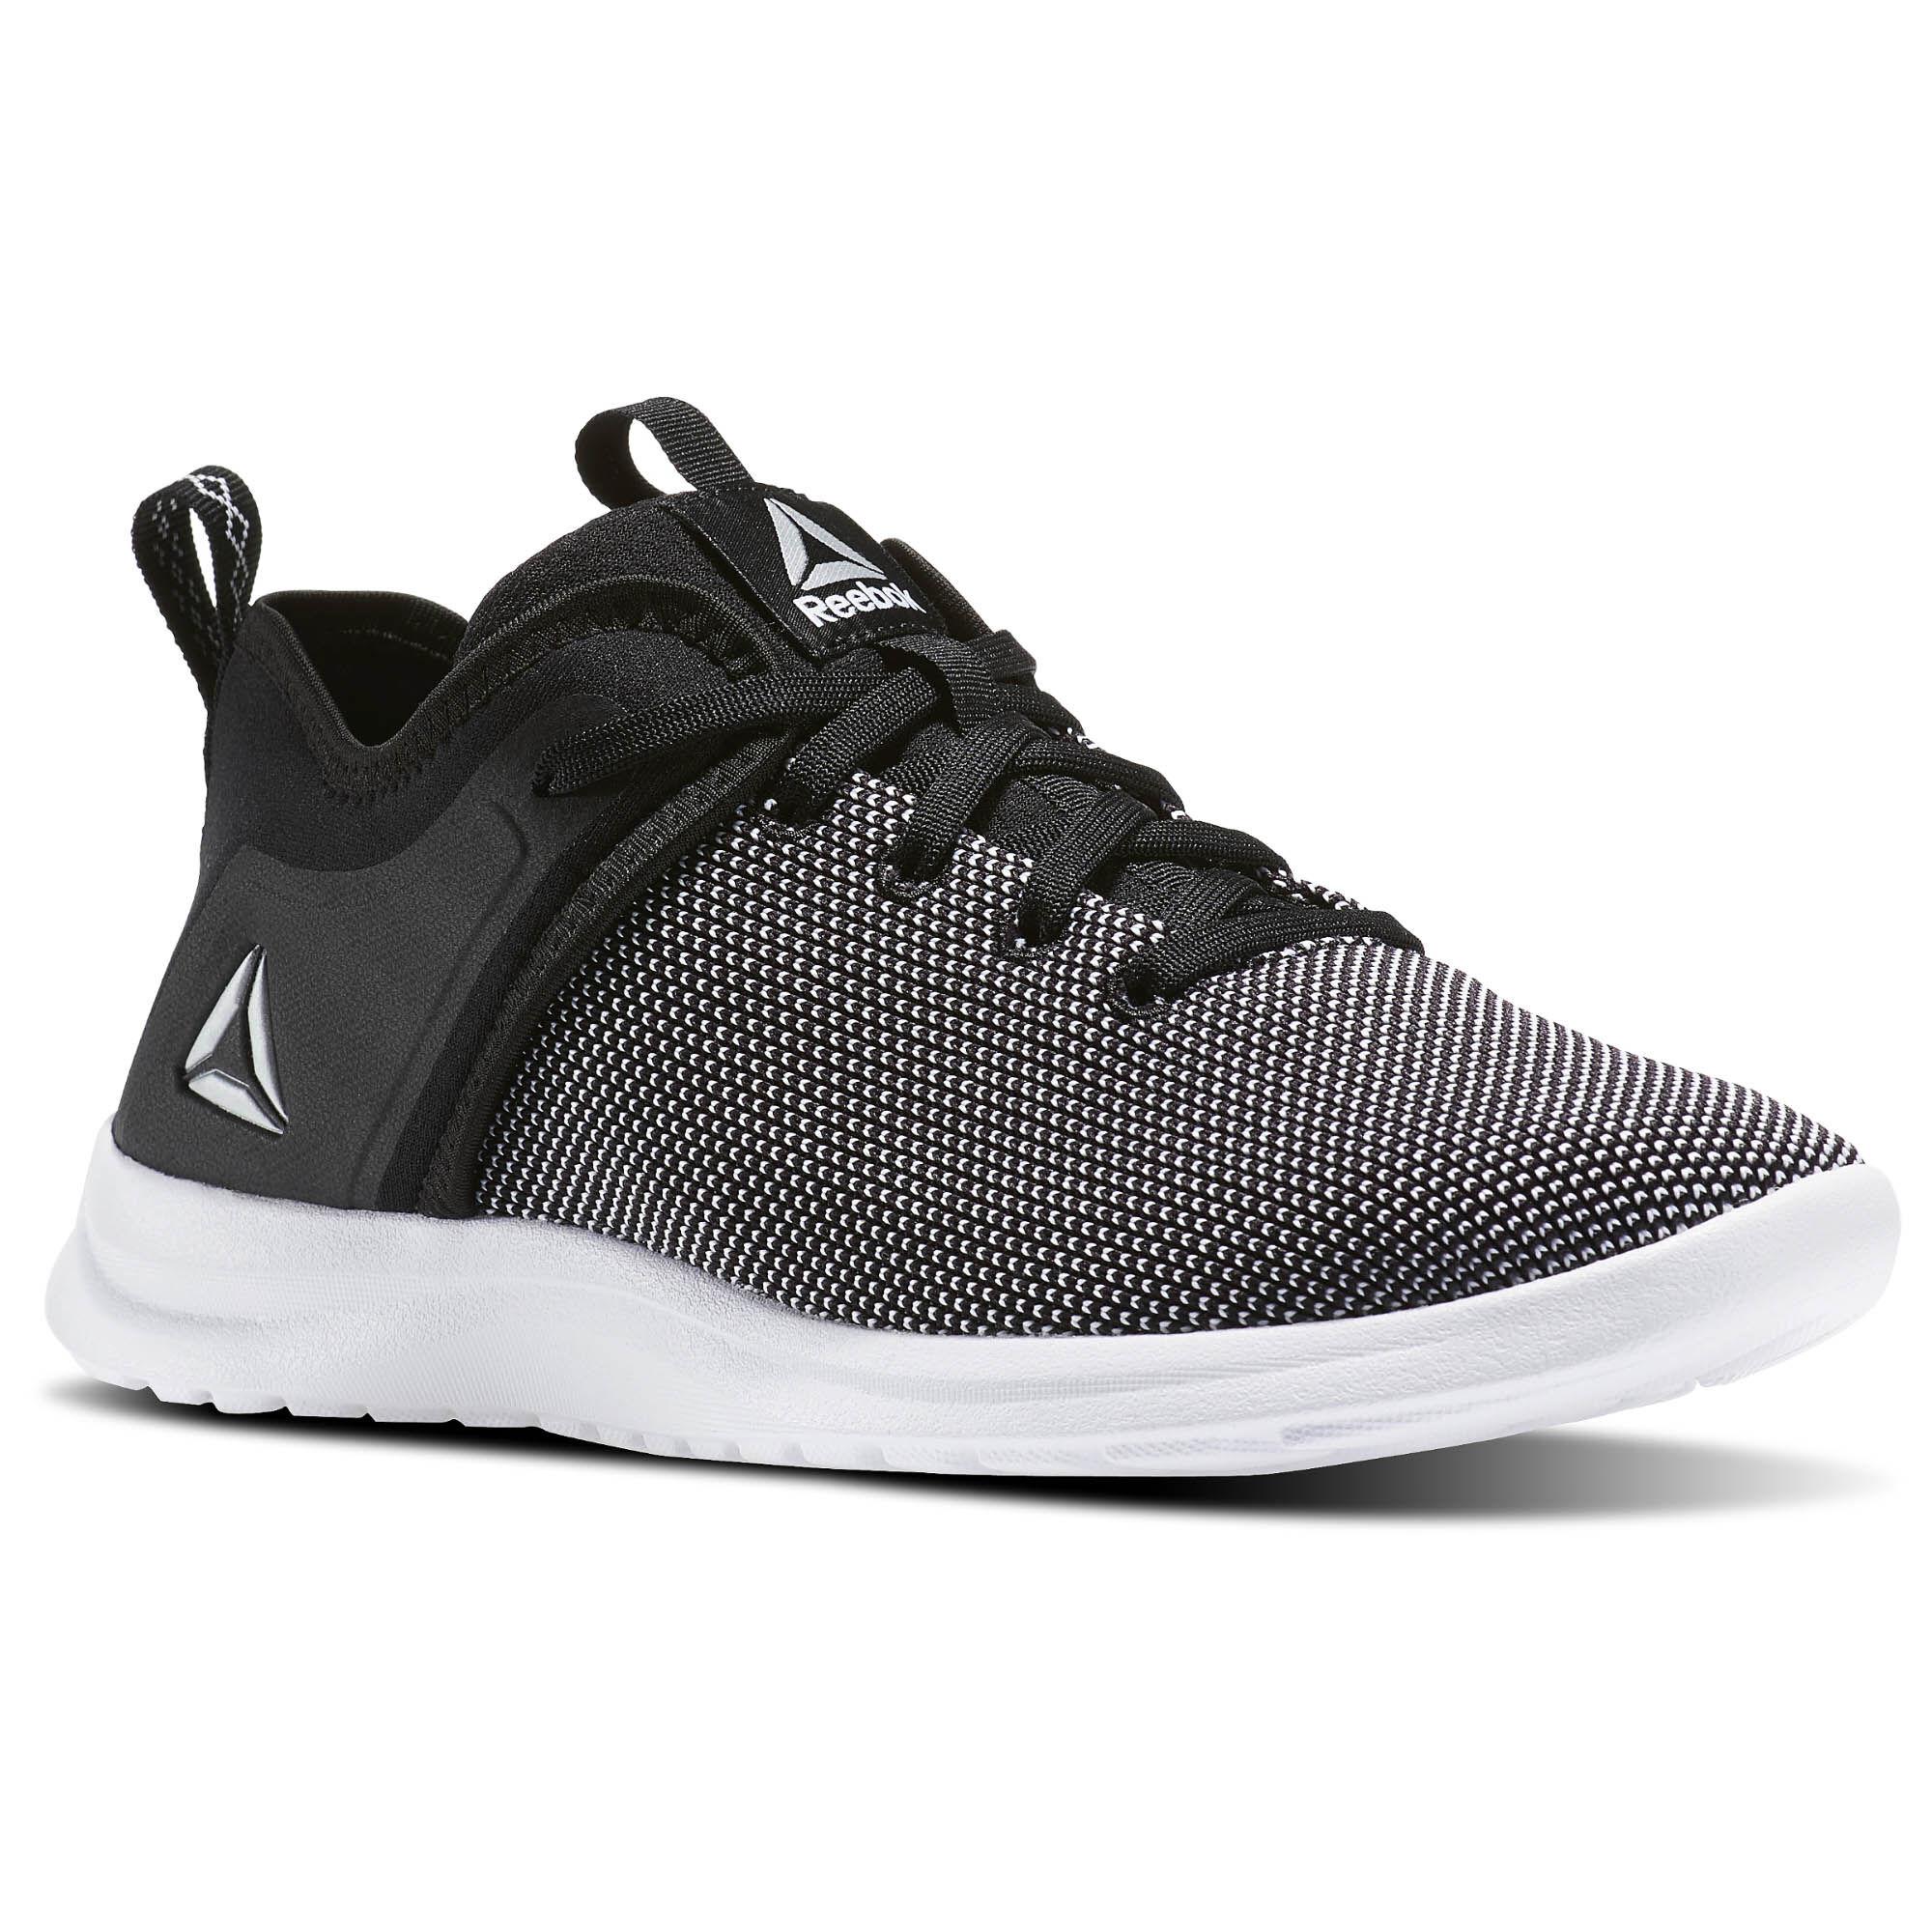 Schuhe Reebok - Solestead BD5744 Black/White RQMTP7Yg